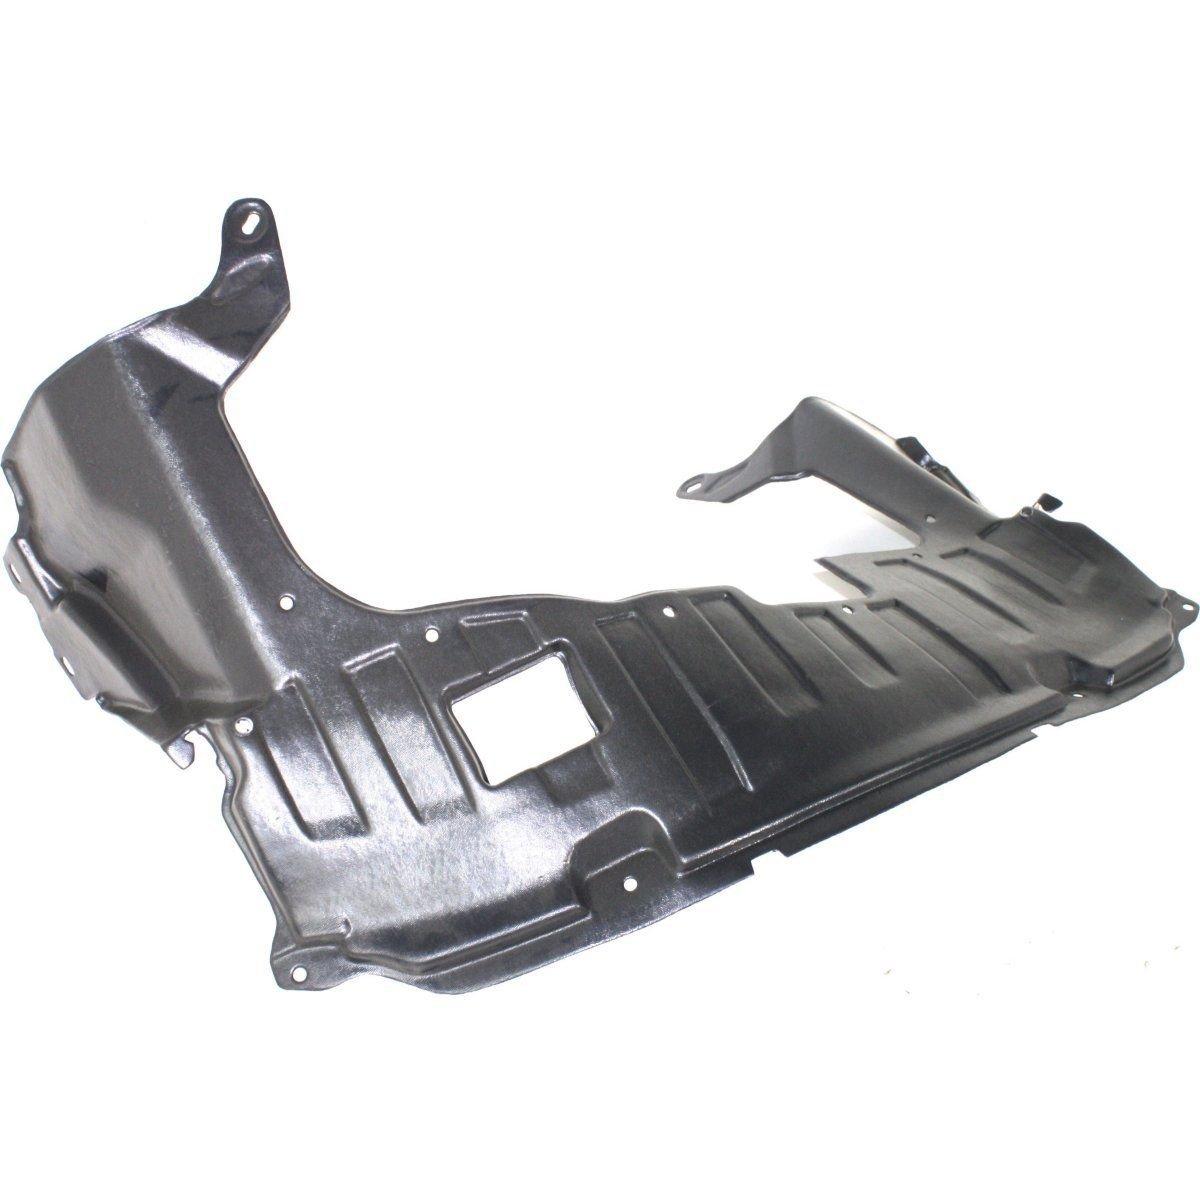 New Front Under Cover Engine Splash Shield For 2007-2008 Honda Fit HO1228108 74111SLNA00